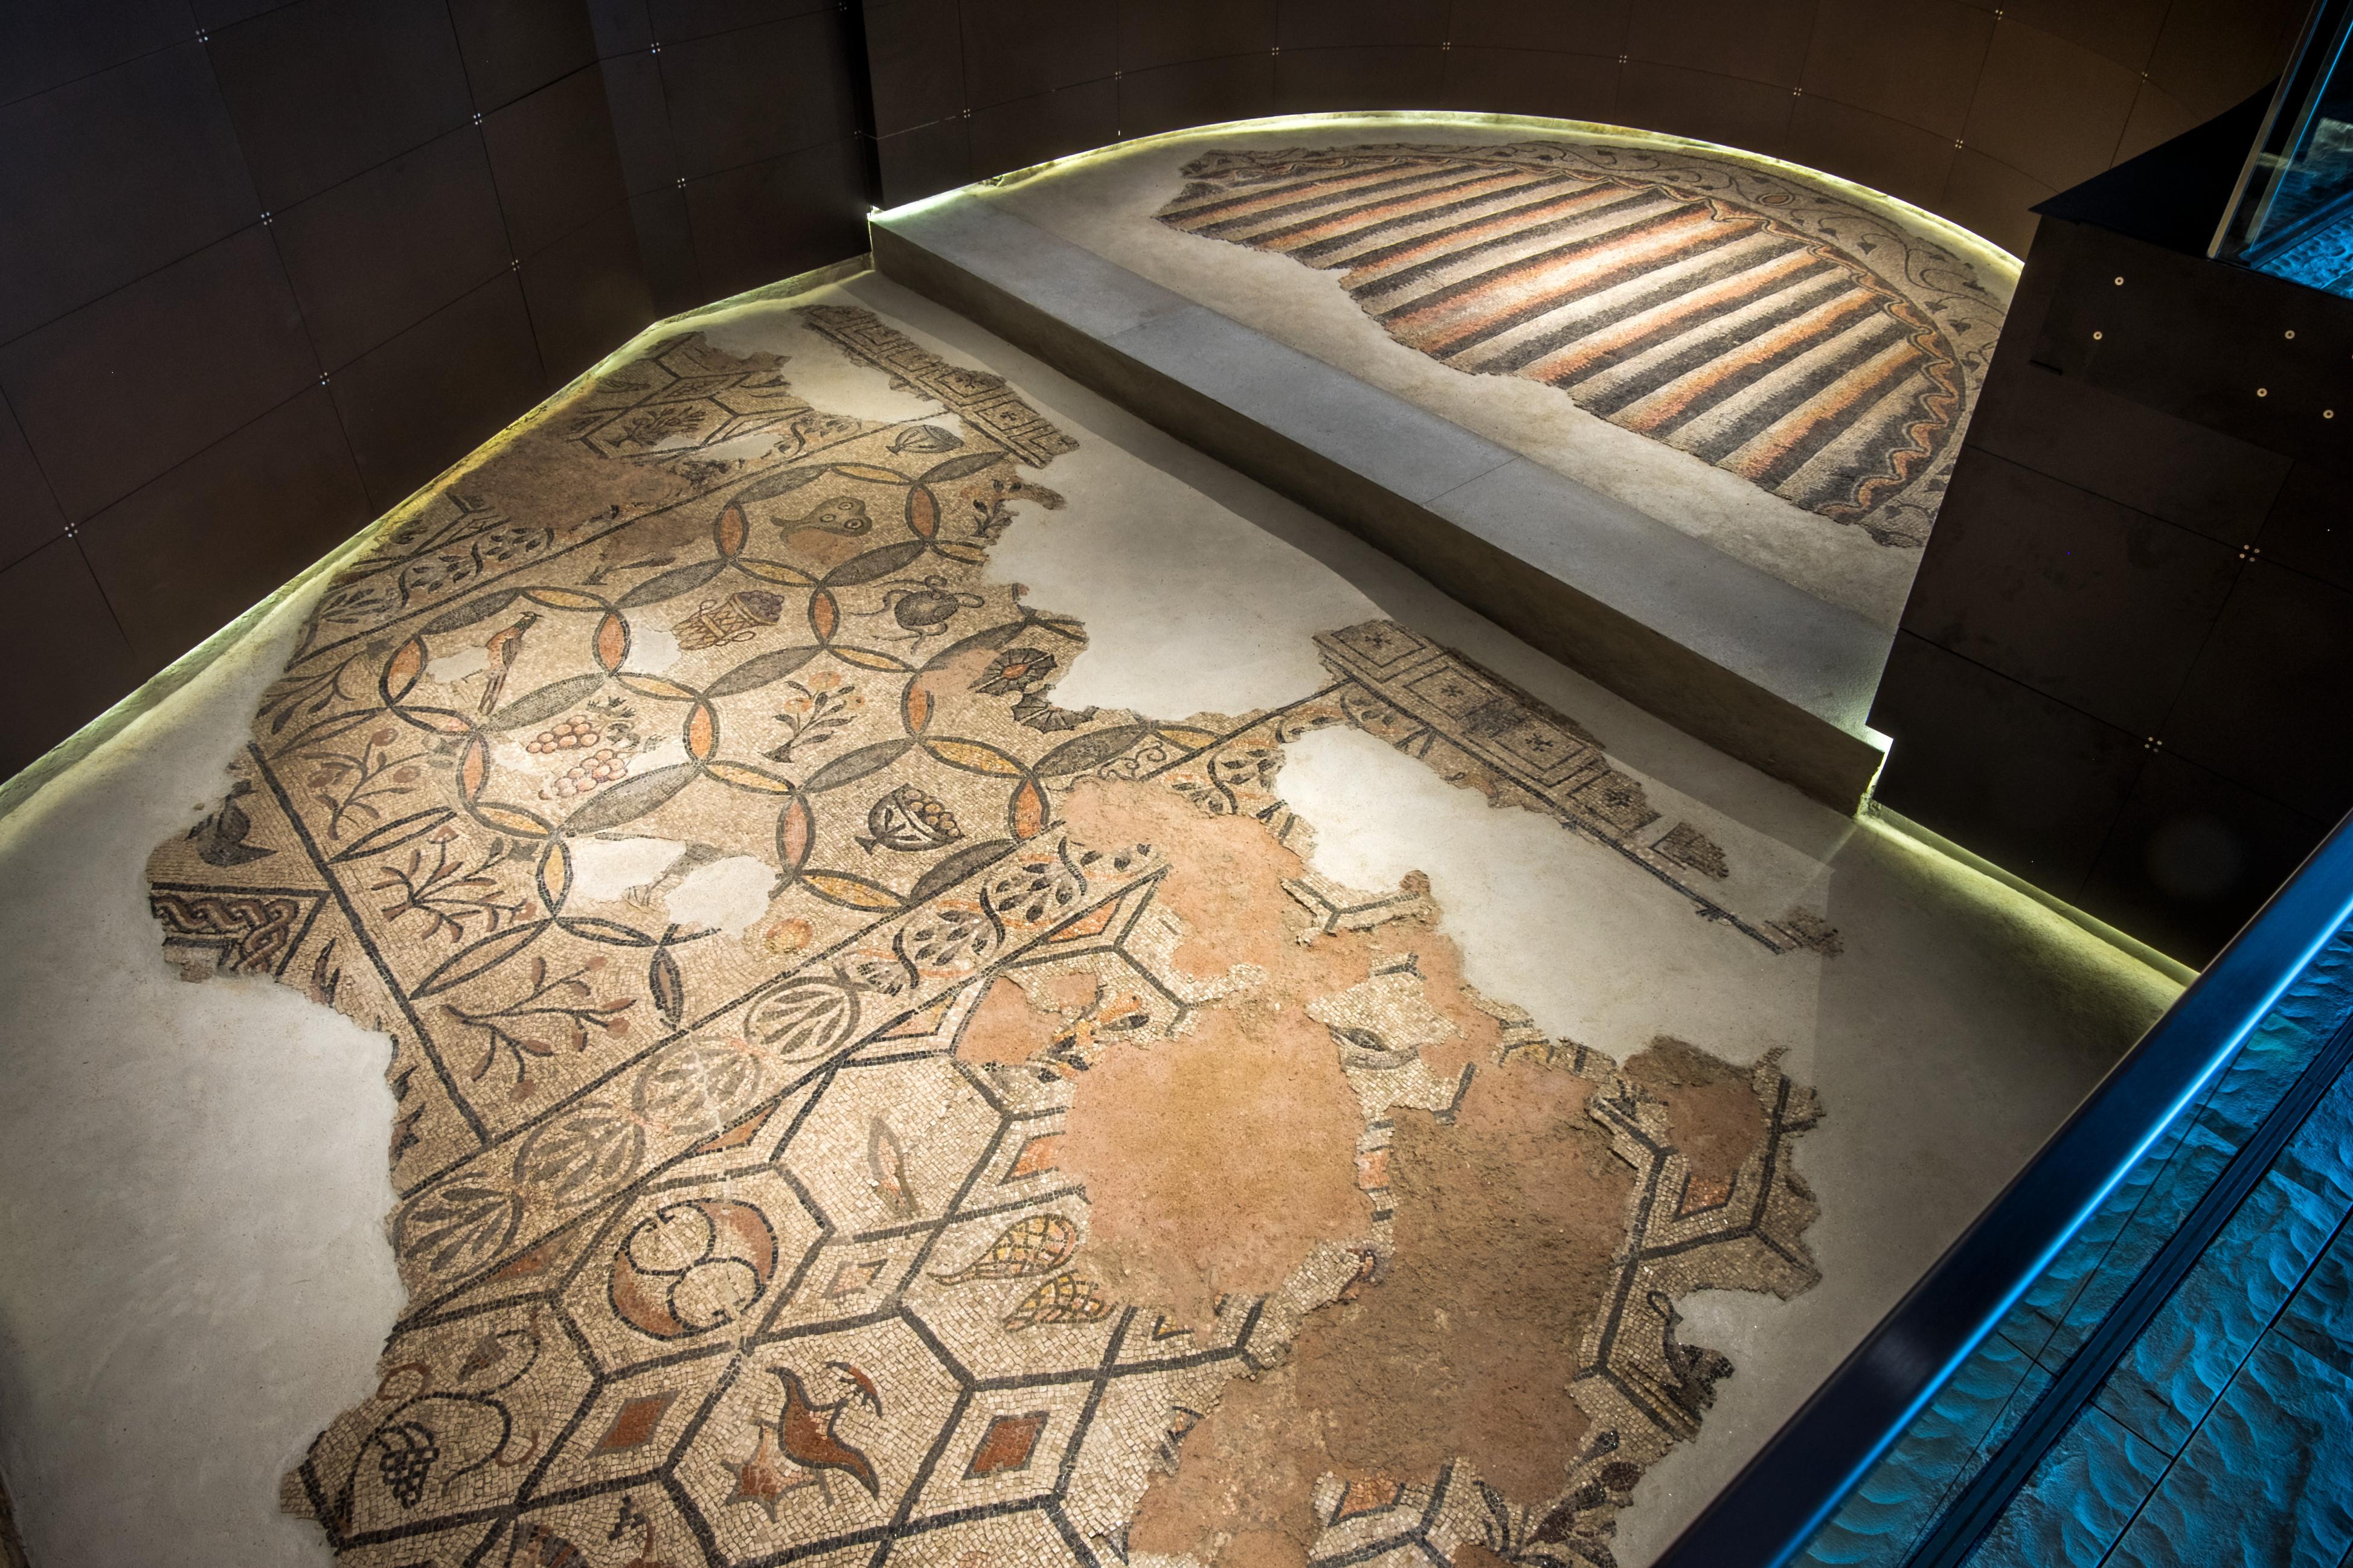 aquileia_domus-e-palazzo-episcopale_mosaico-aula-absidata_foto-g-baronchelli